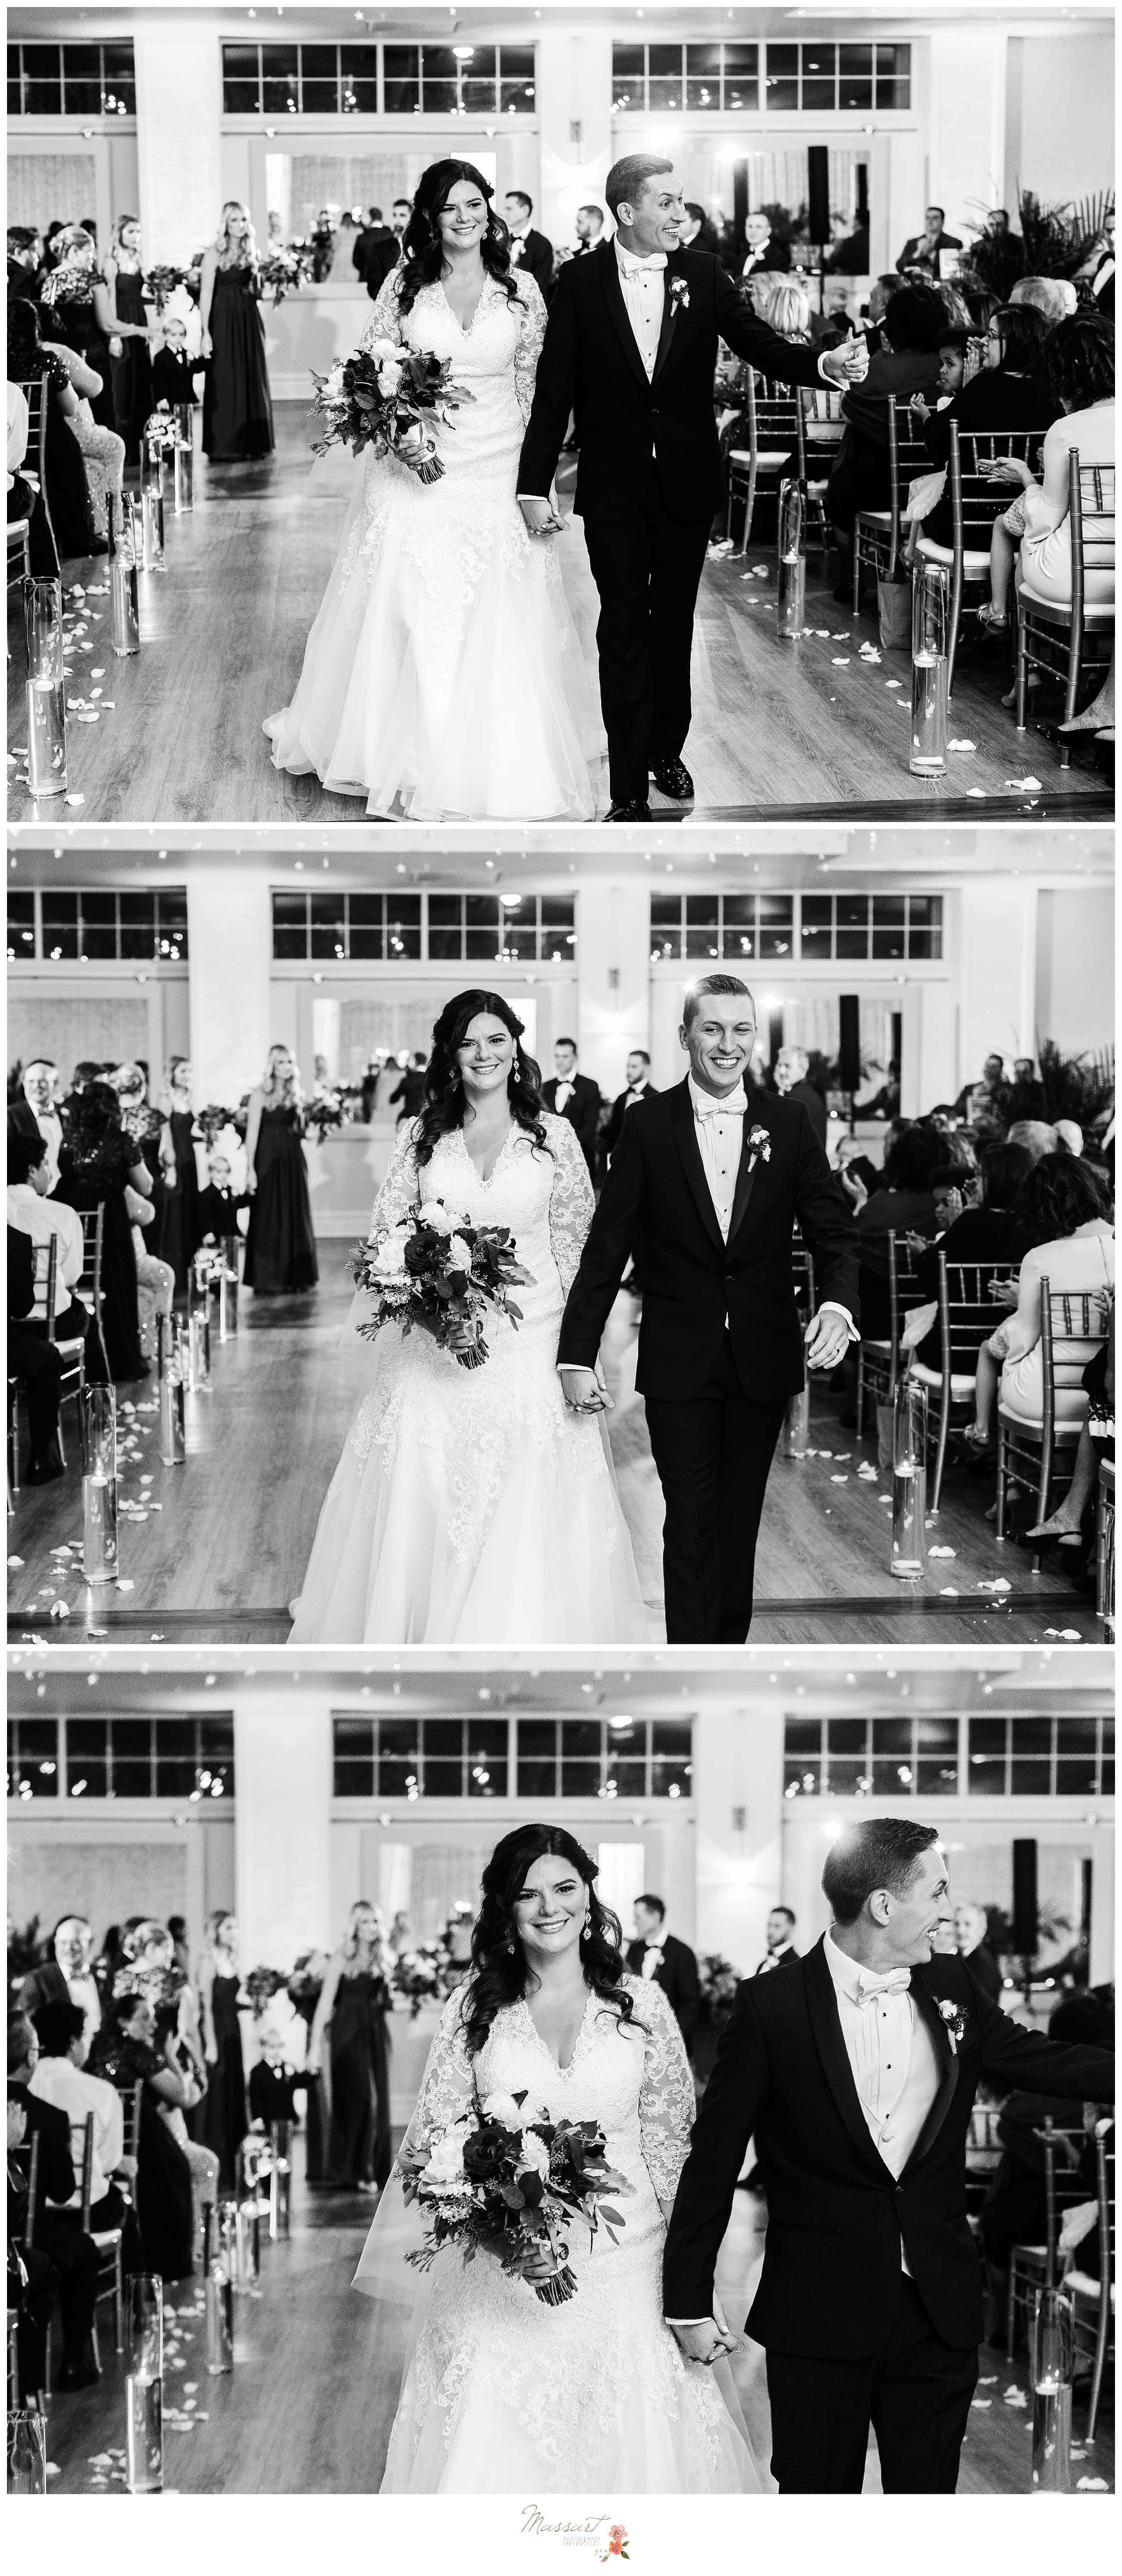 Bride and groom exit wedding ceremony at the atlantic resort in RI